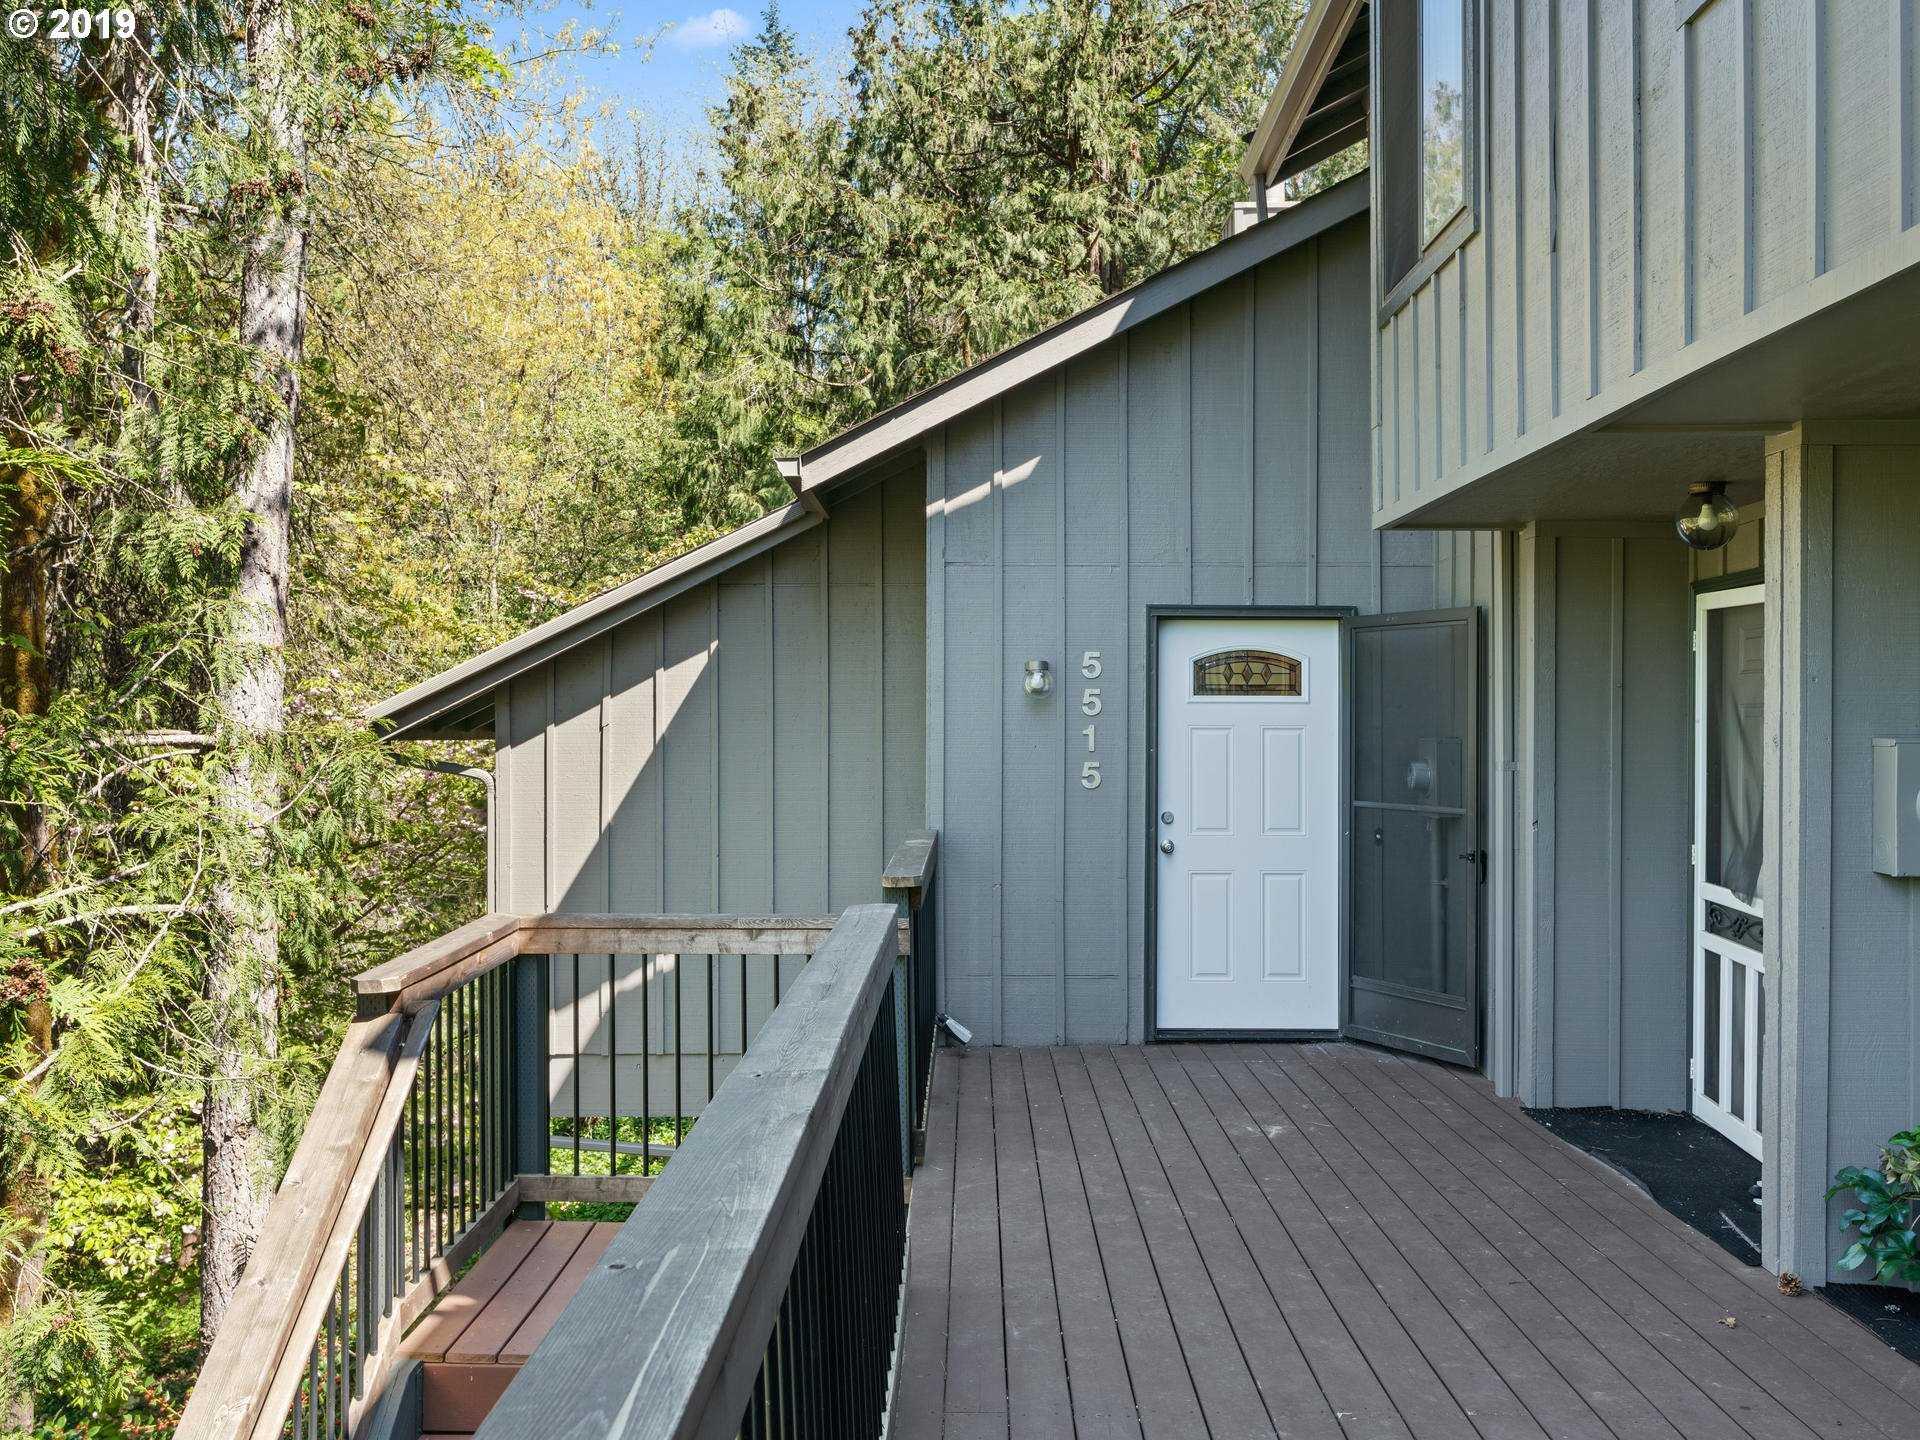 $232,000 - 3Br/2Ba -  for Sale in Hidden Village, Portland